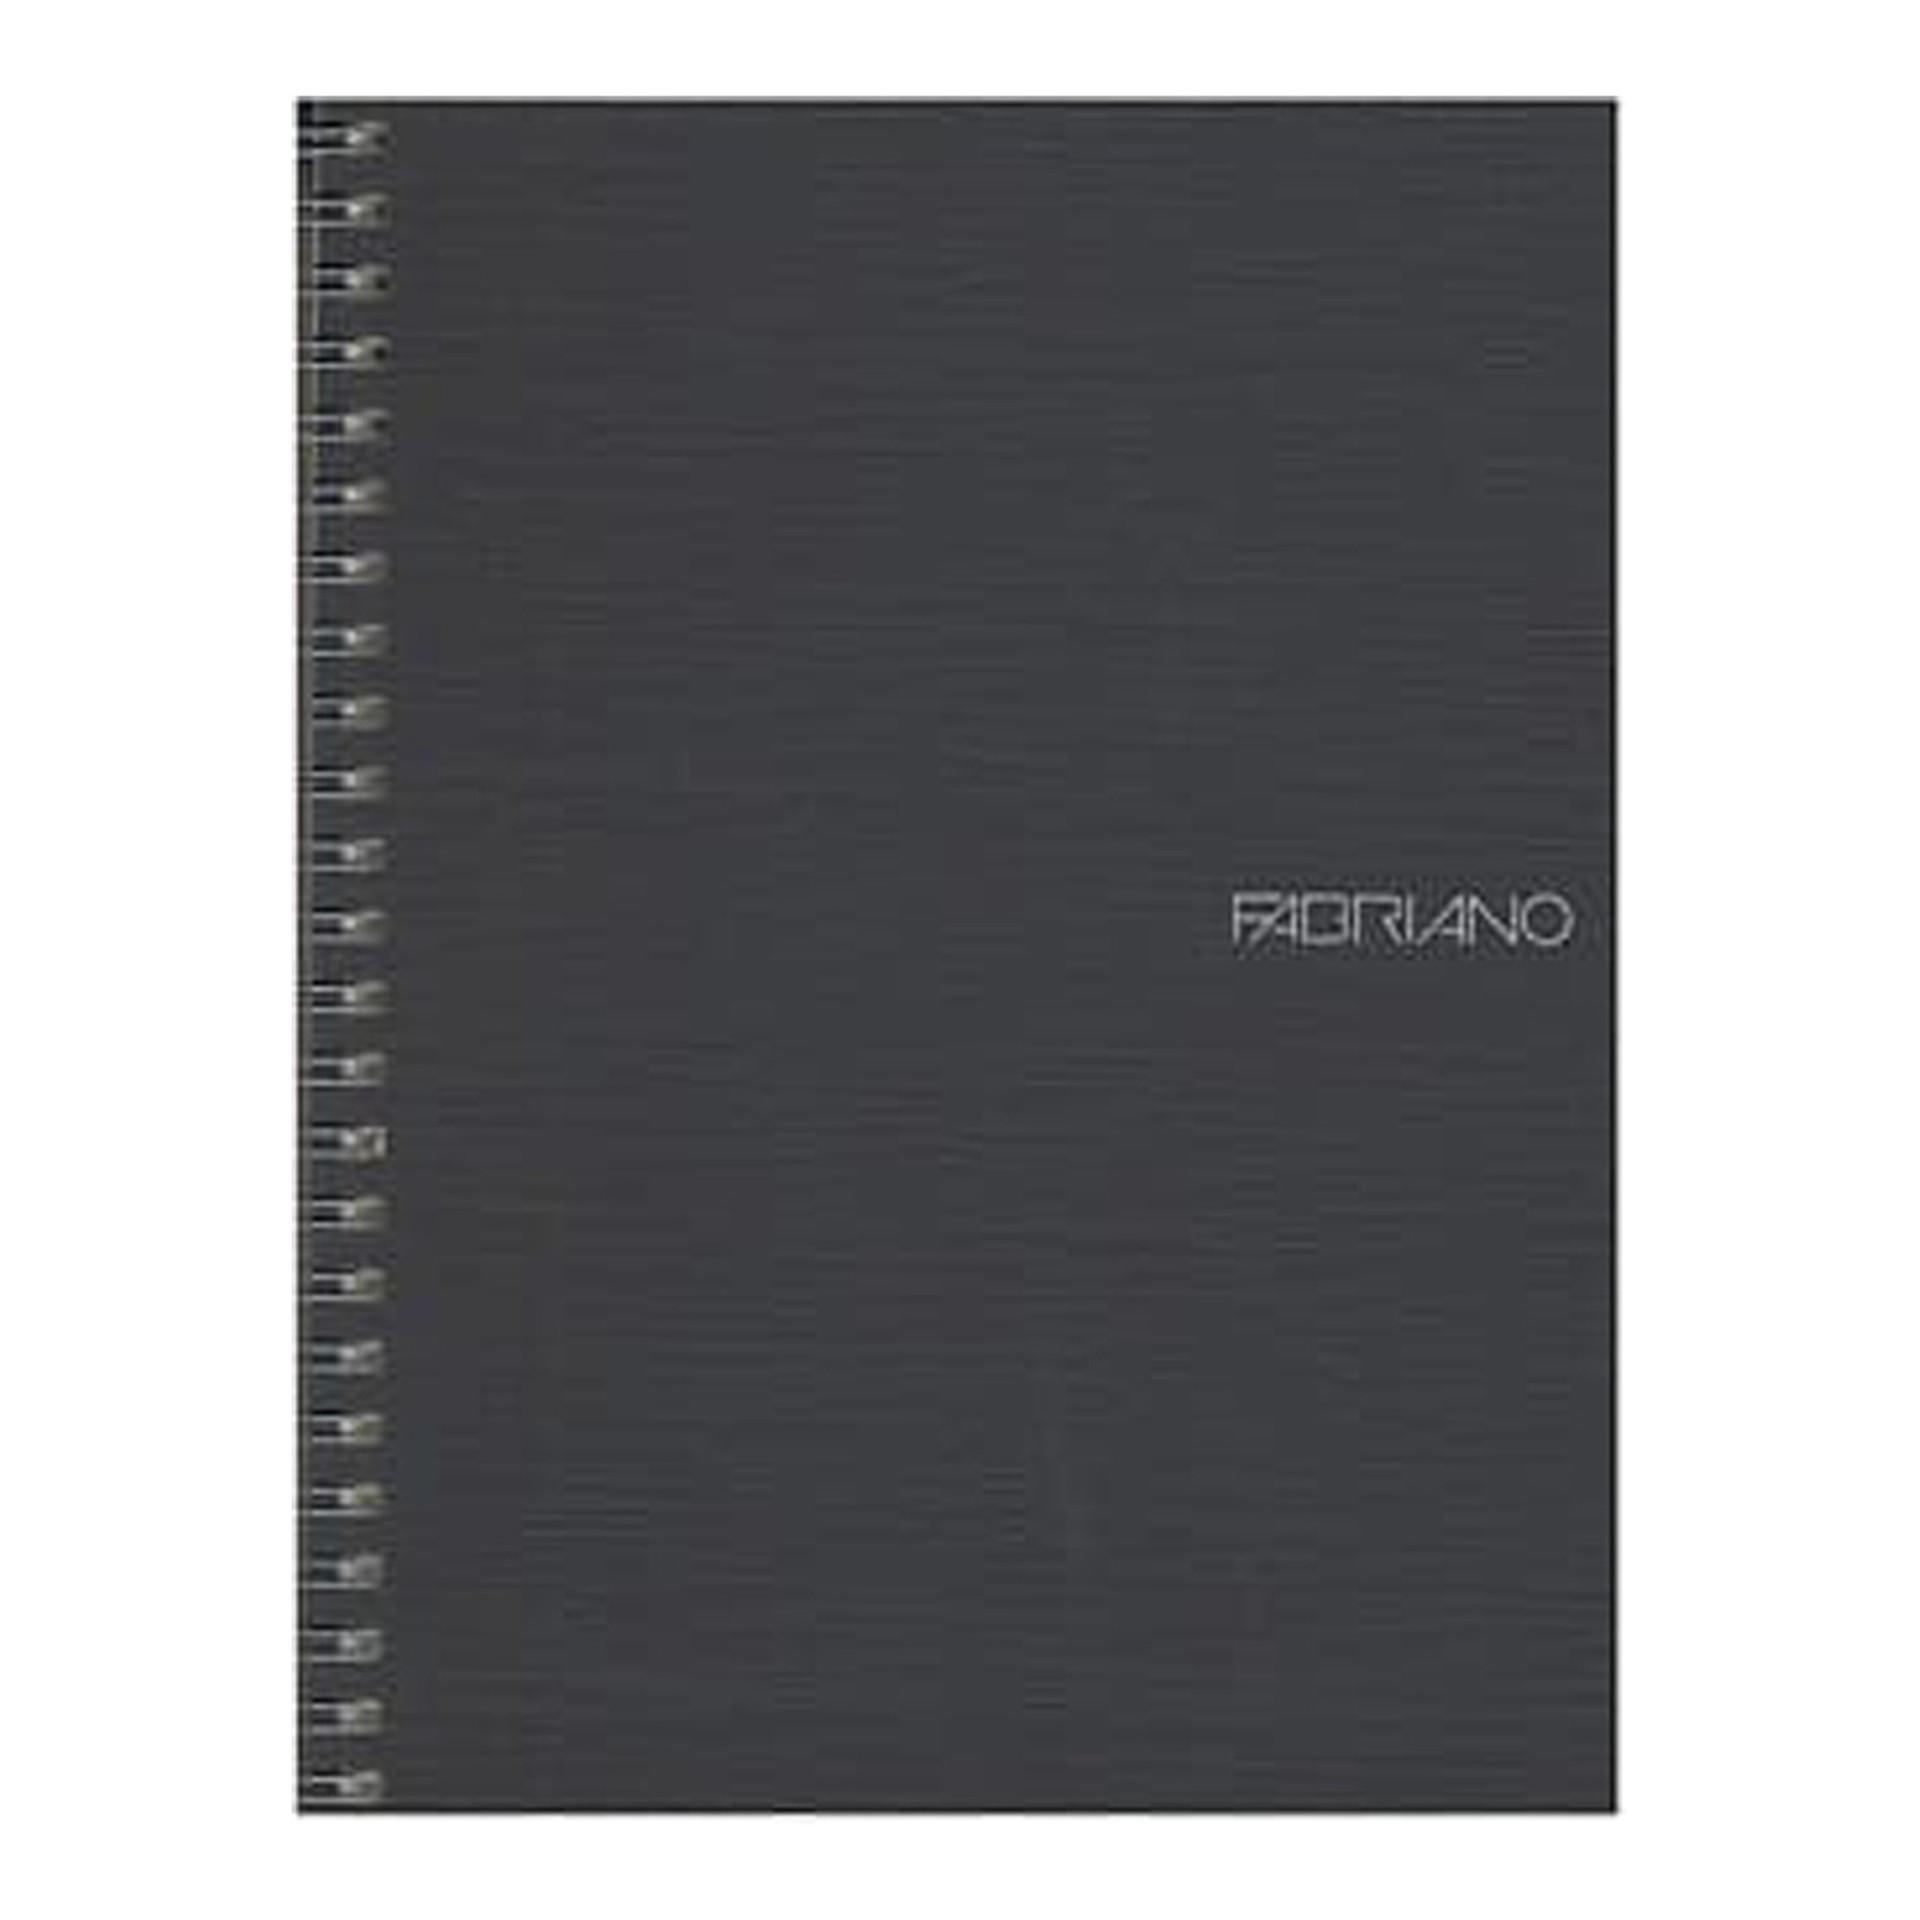 "Fabriano EcoQua Wire Bound Blank 6""x8"" Notebook Black"